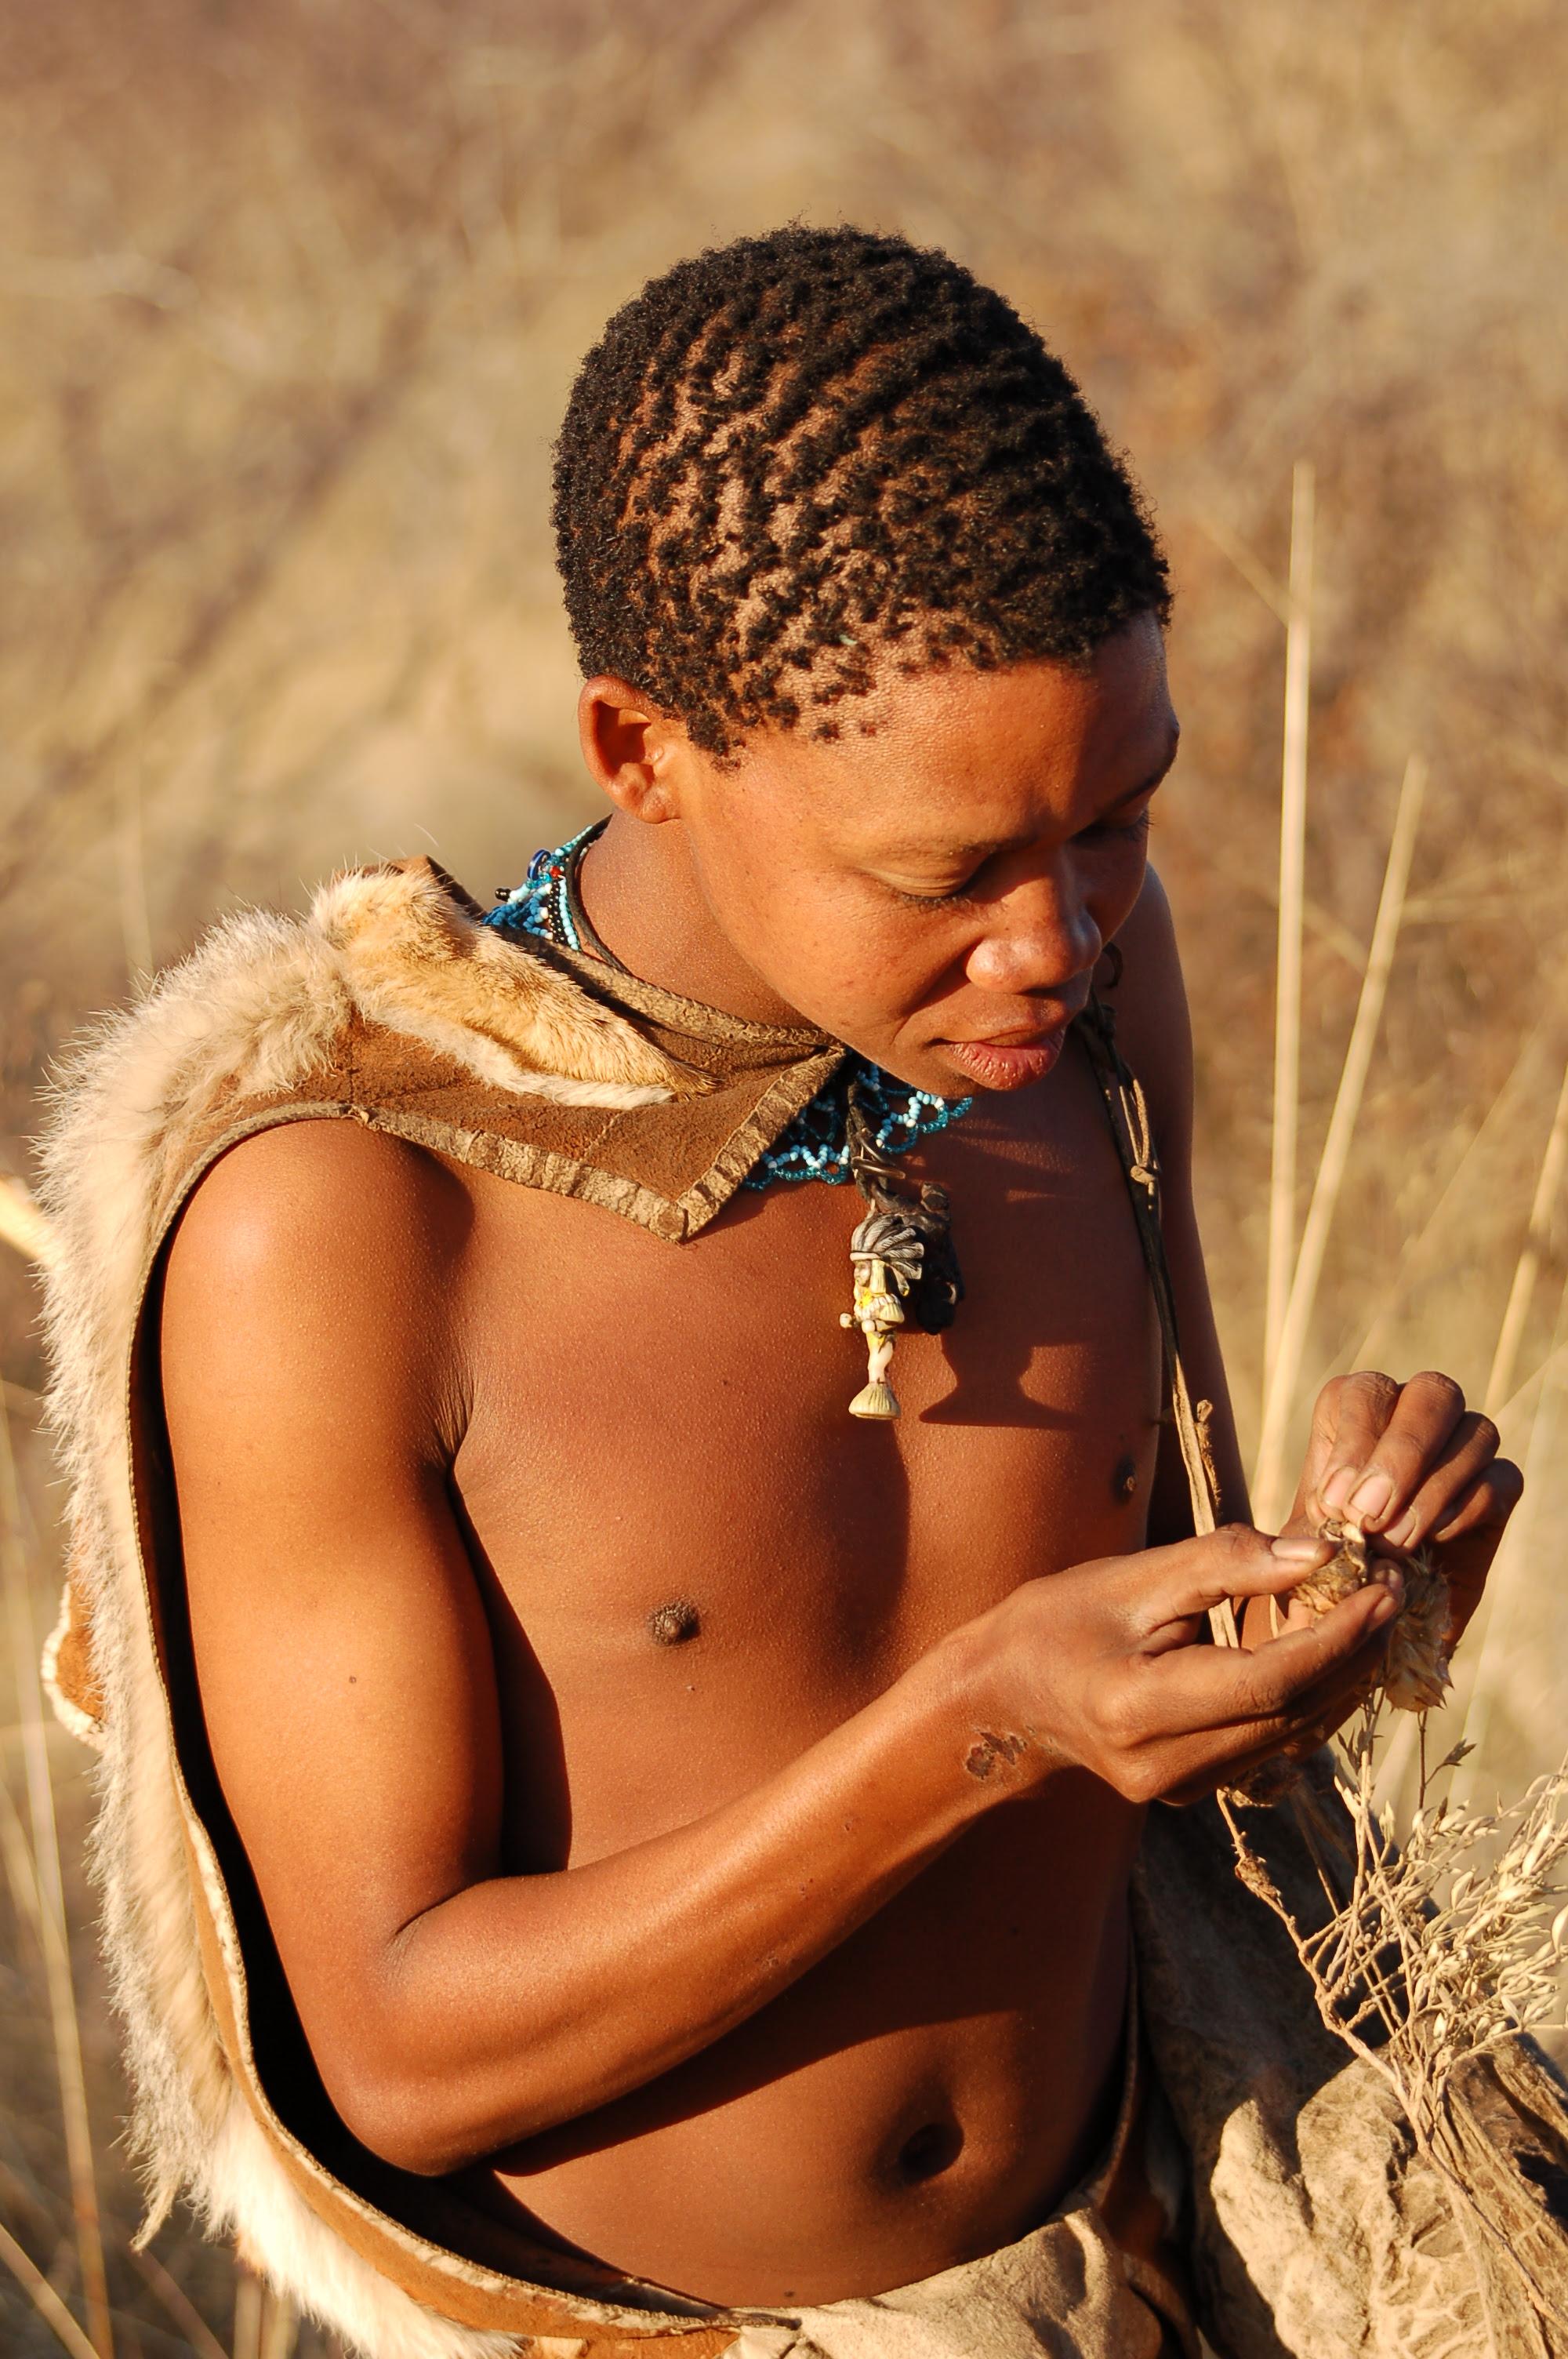 ayo vXIJx1RRBQ8Sdi2zt7AioGP JQvilndOYu5BfvBaaMA0QzVuoP6OZBY b60aZGwnynmZJrd3zP3Rkq8sfS9g3HsOsmerxgotQ85ADVE=s0 d San Bushmen People, The World Most Ancient Race People In Africa